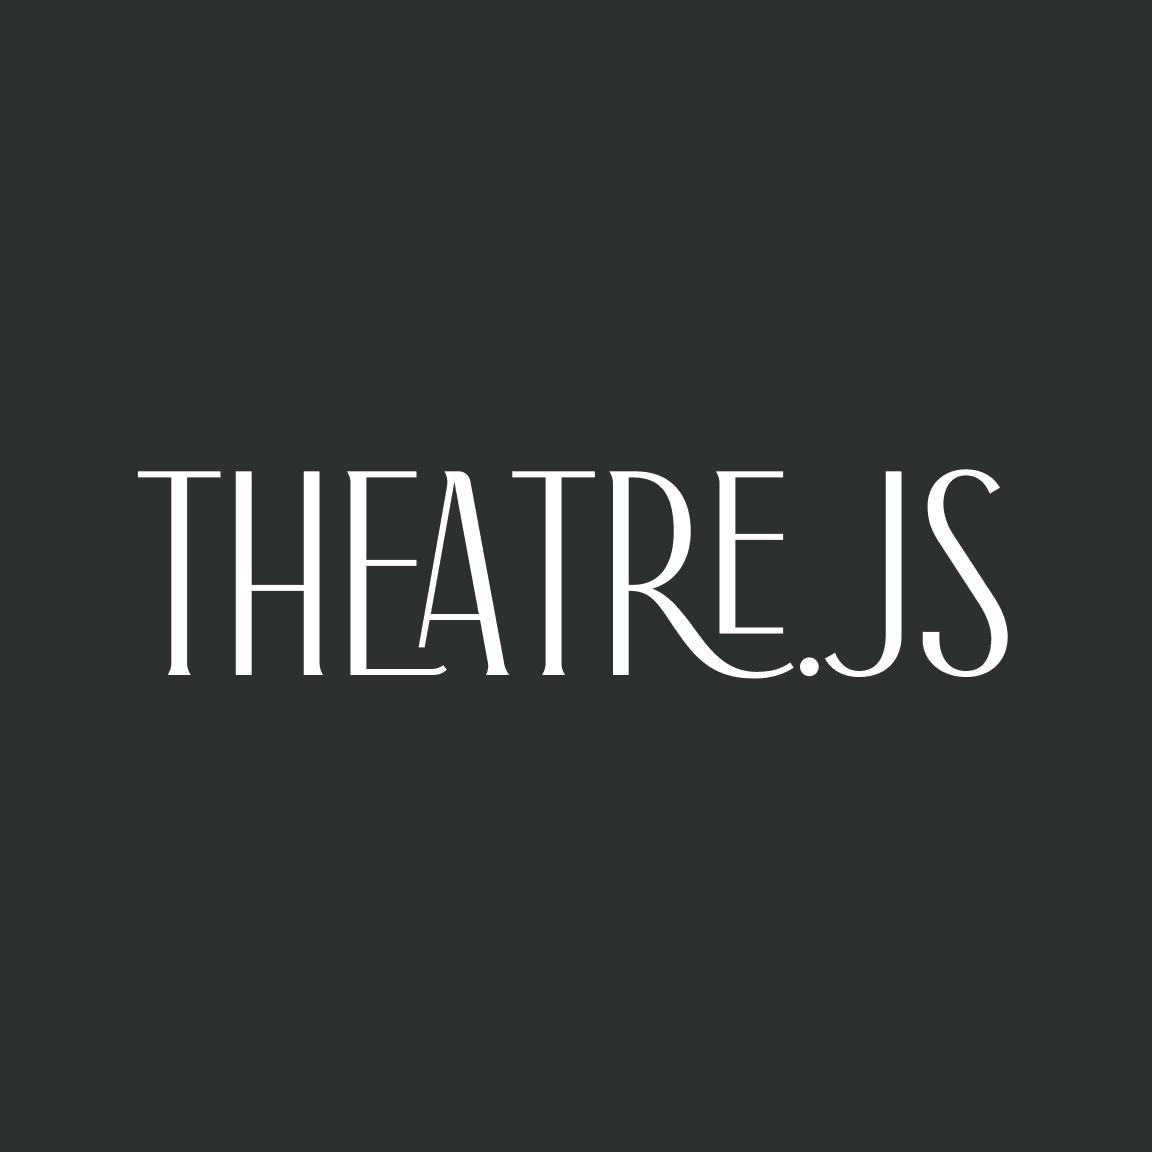 built with theatre js